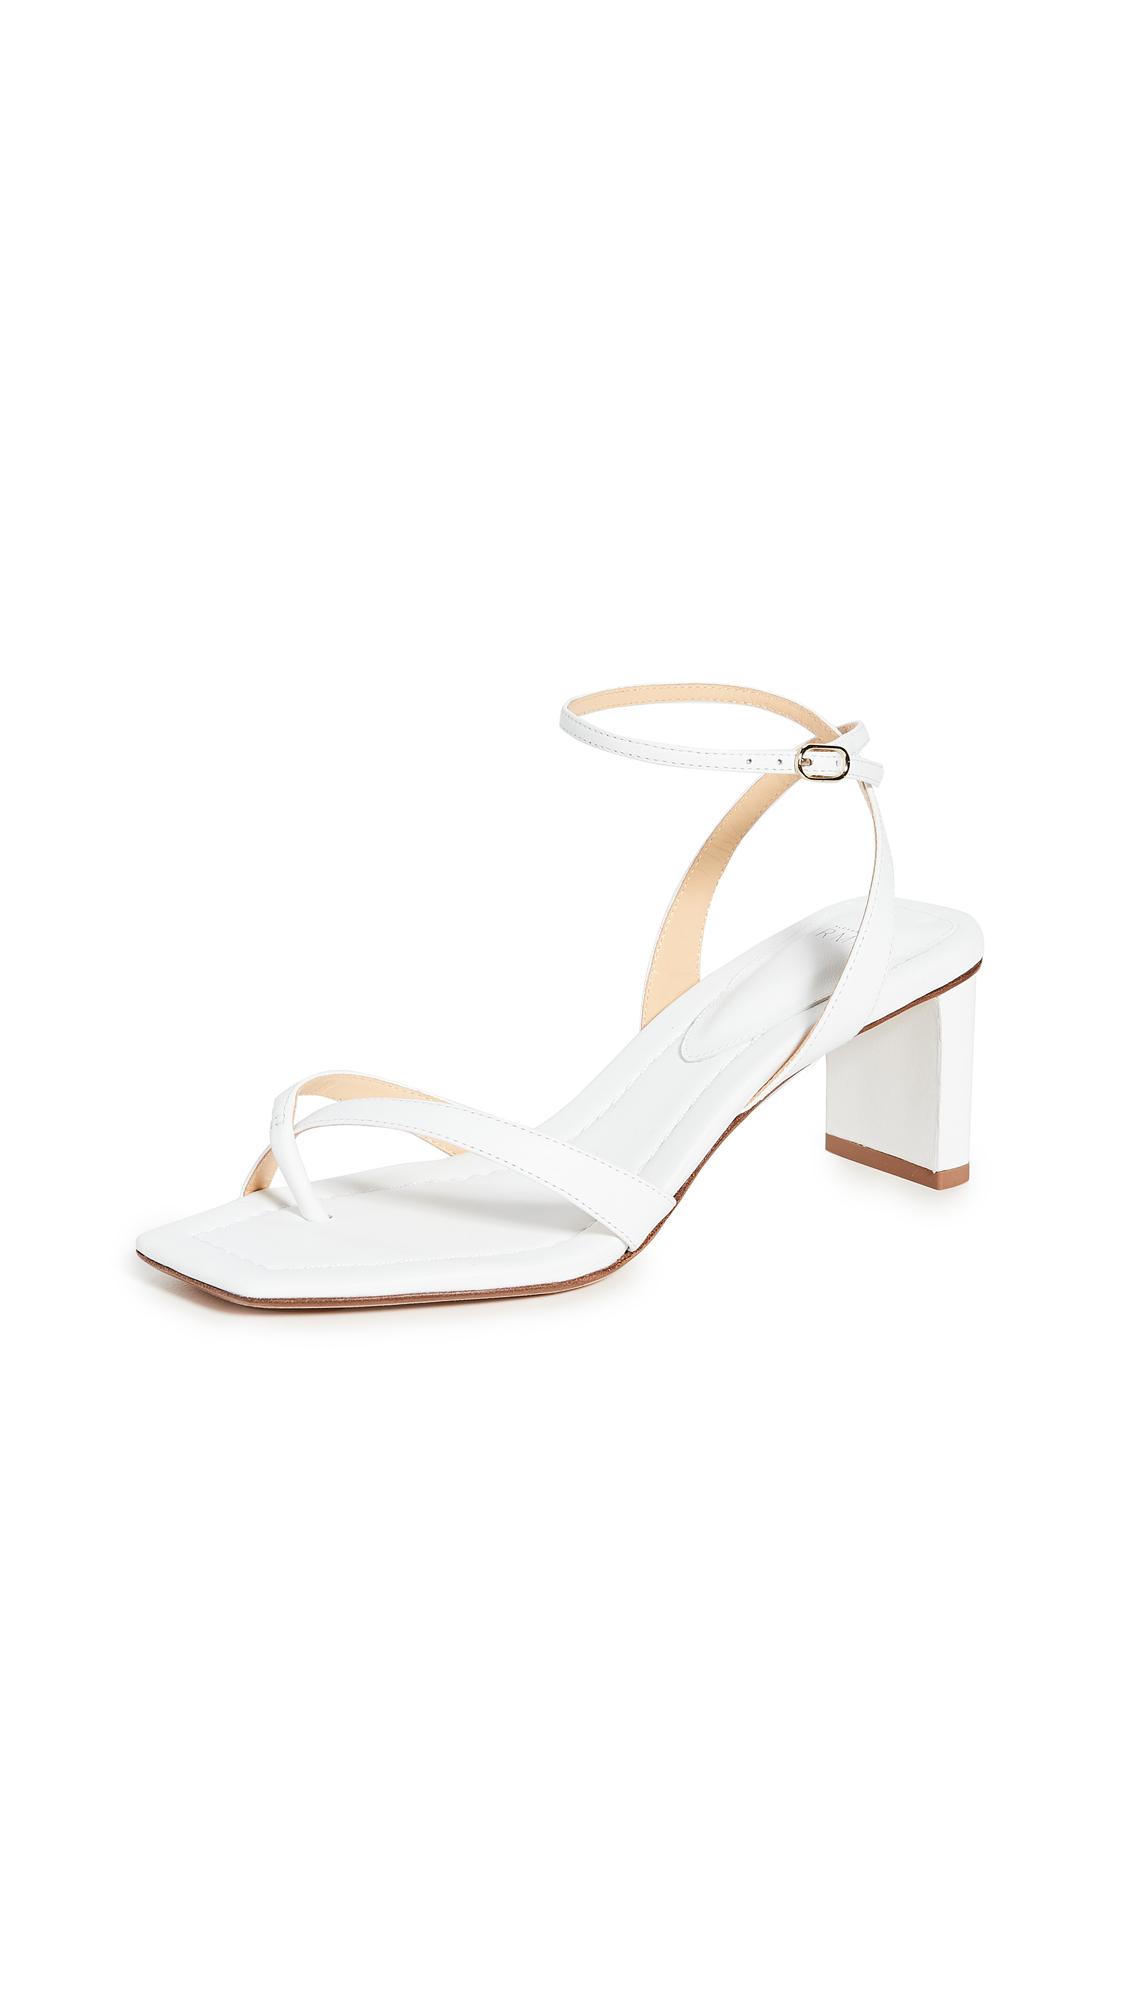 Buy Alexandre Birman Nelly Square Sandals online, shop Alexandre Birman